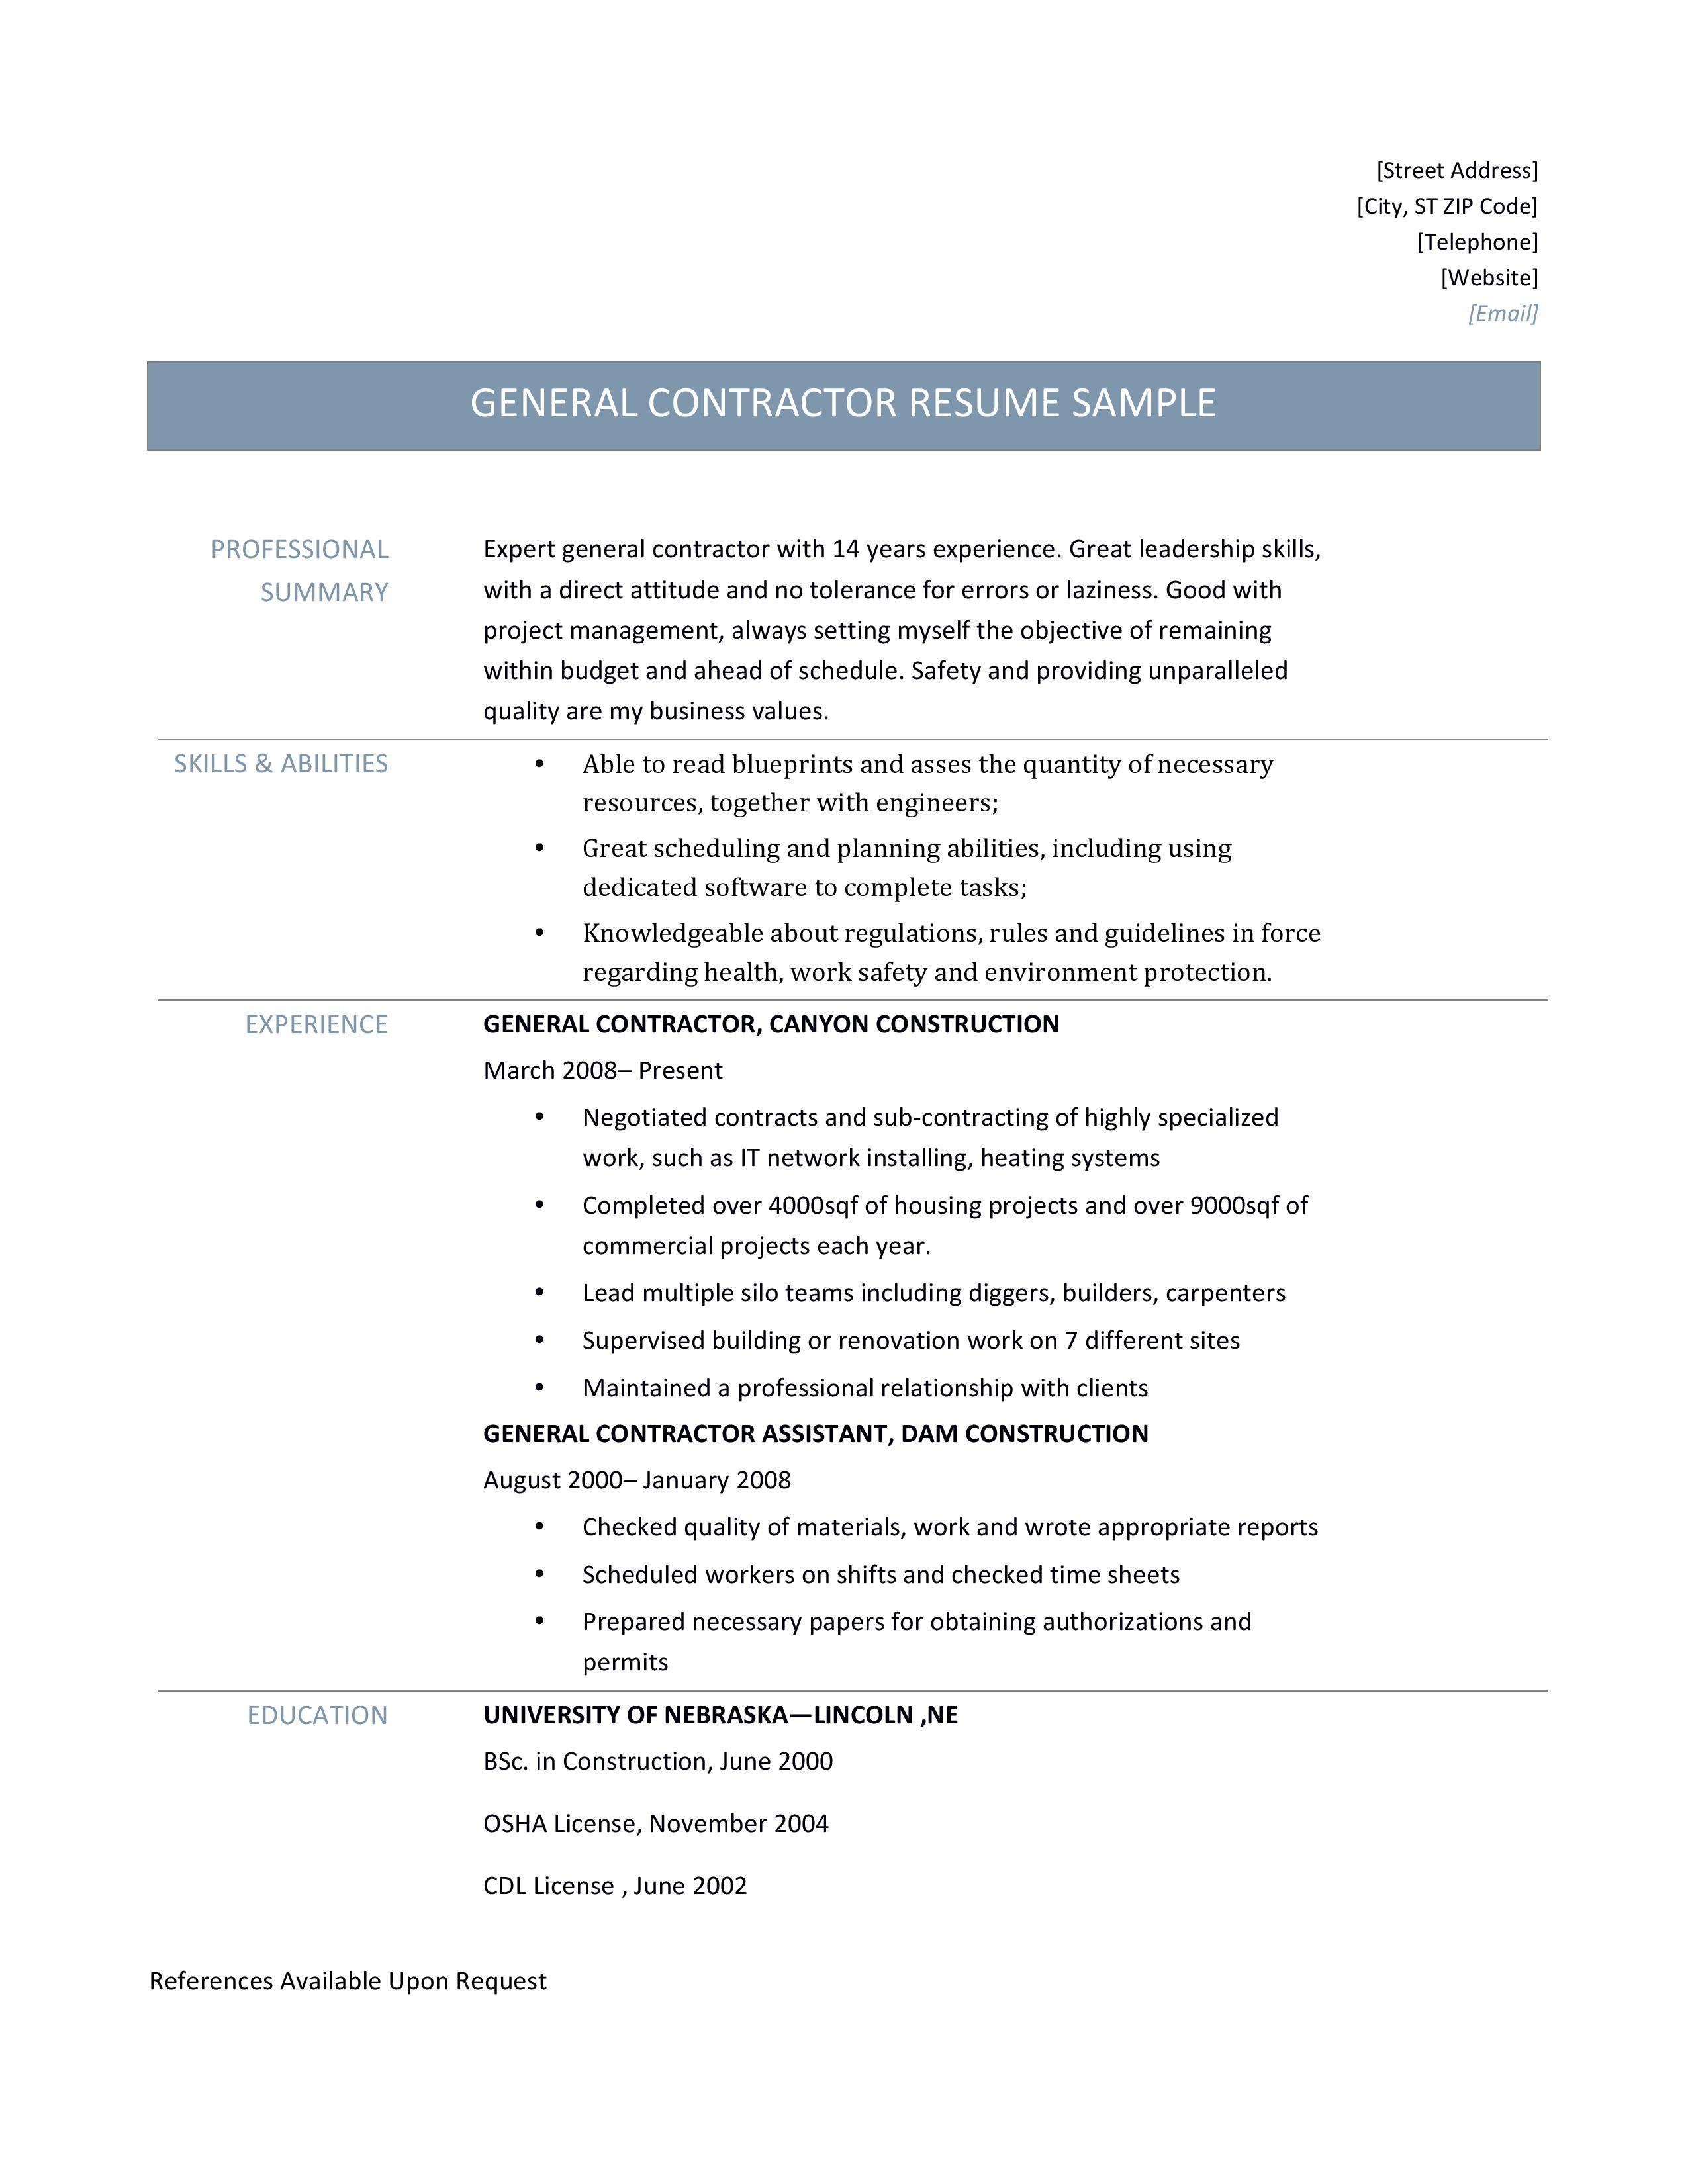 General Contractor Resume Templates Job Resume Examples Resume Examples Resume